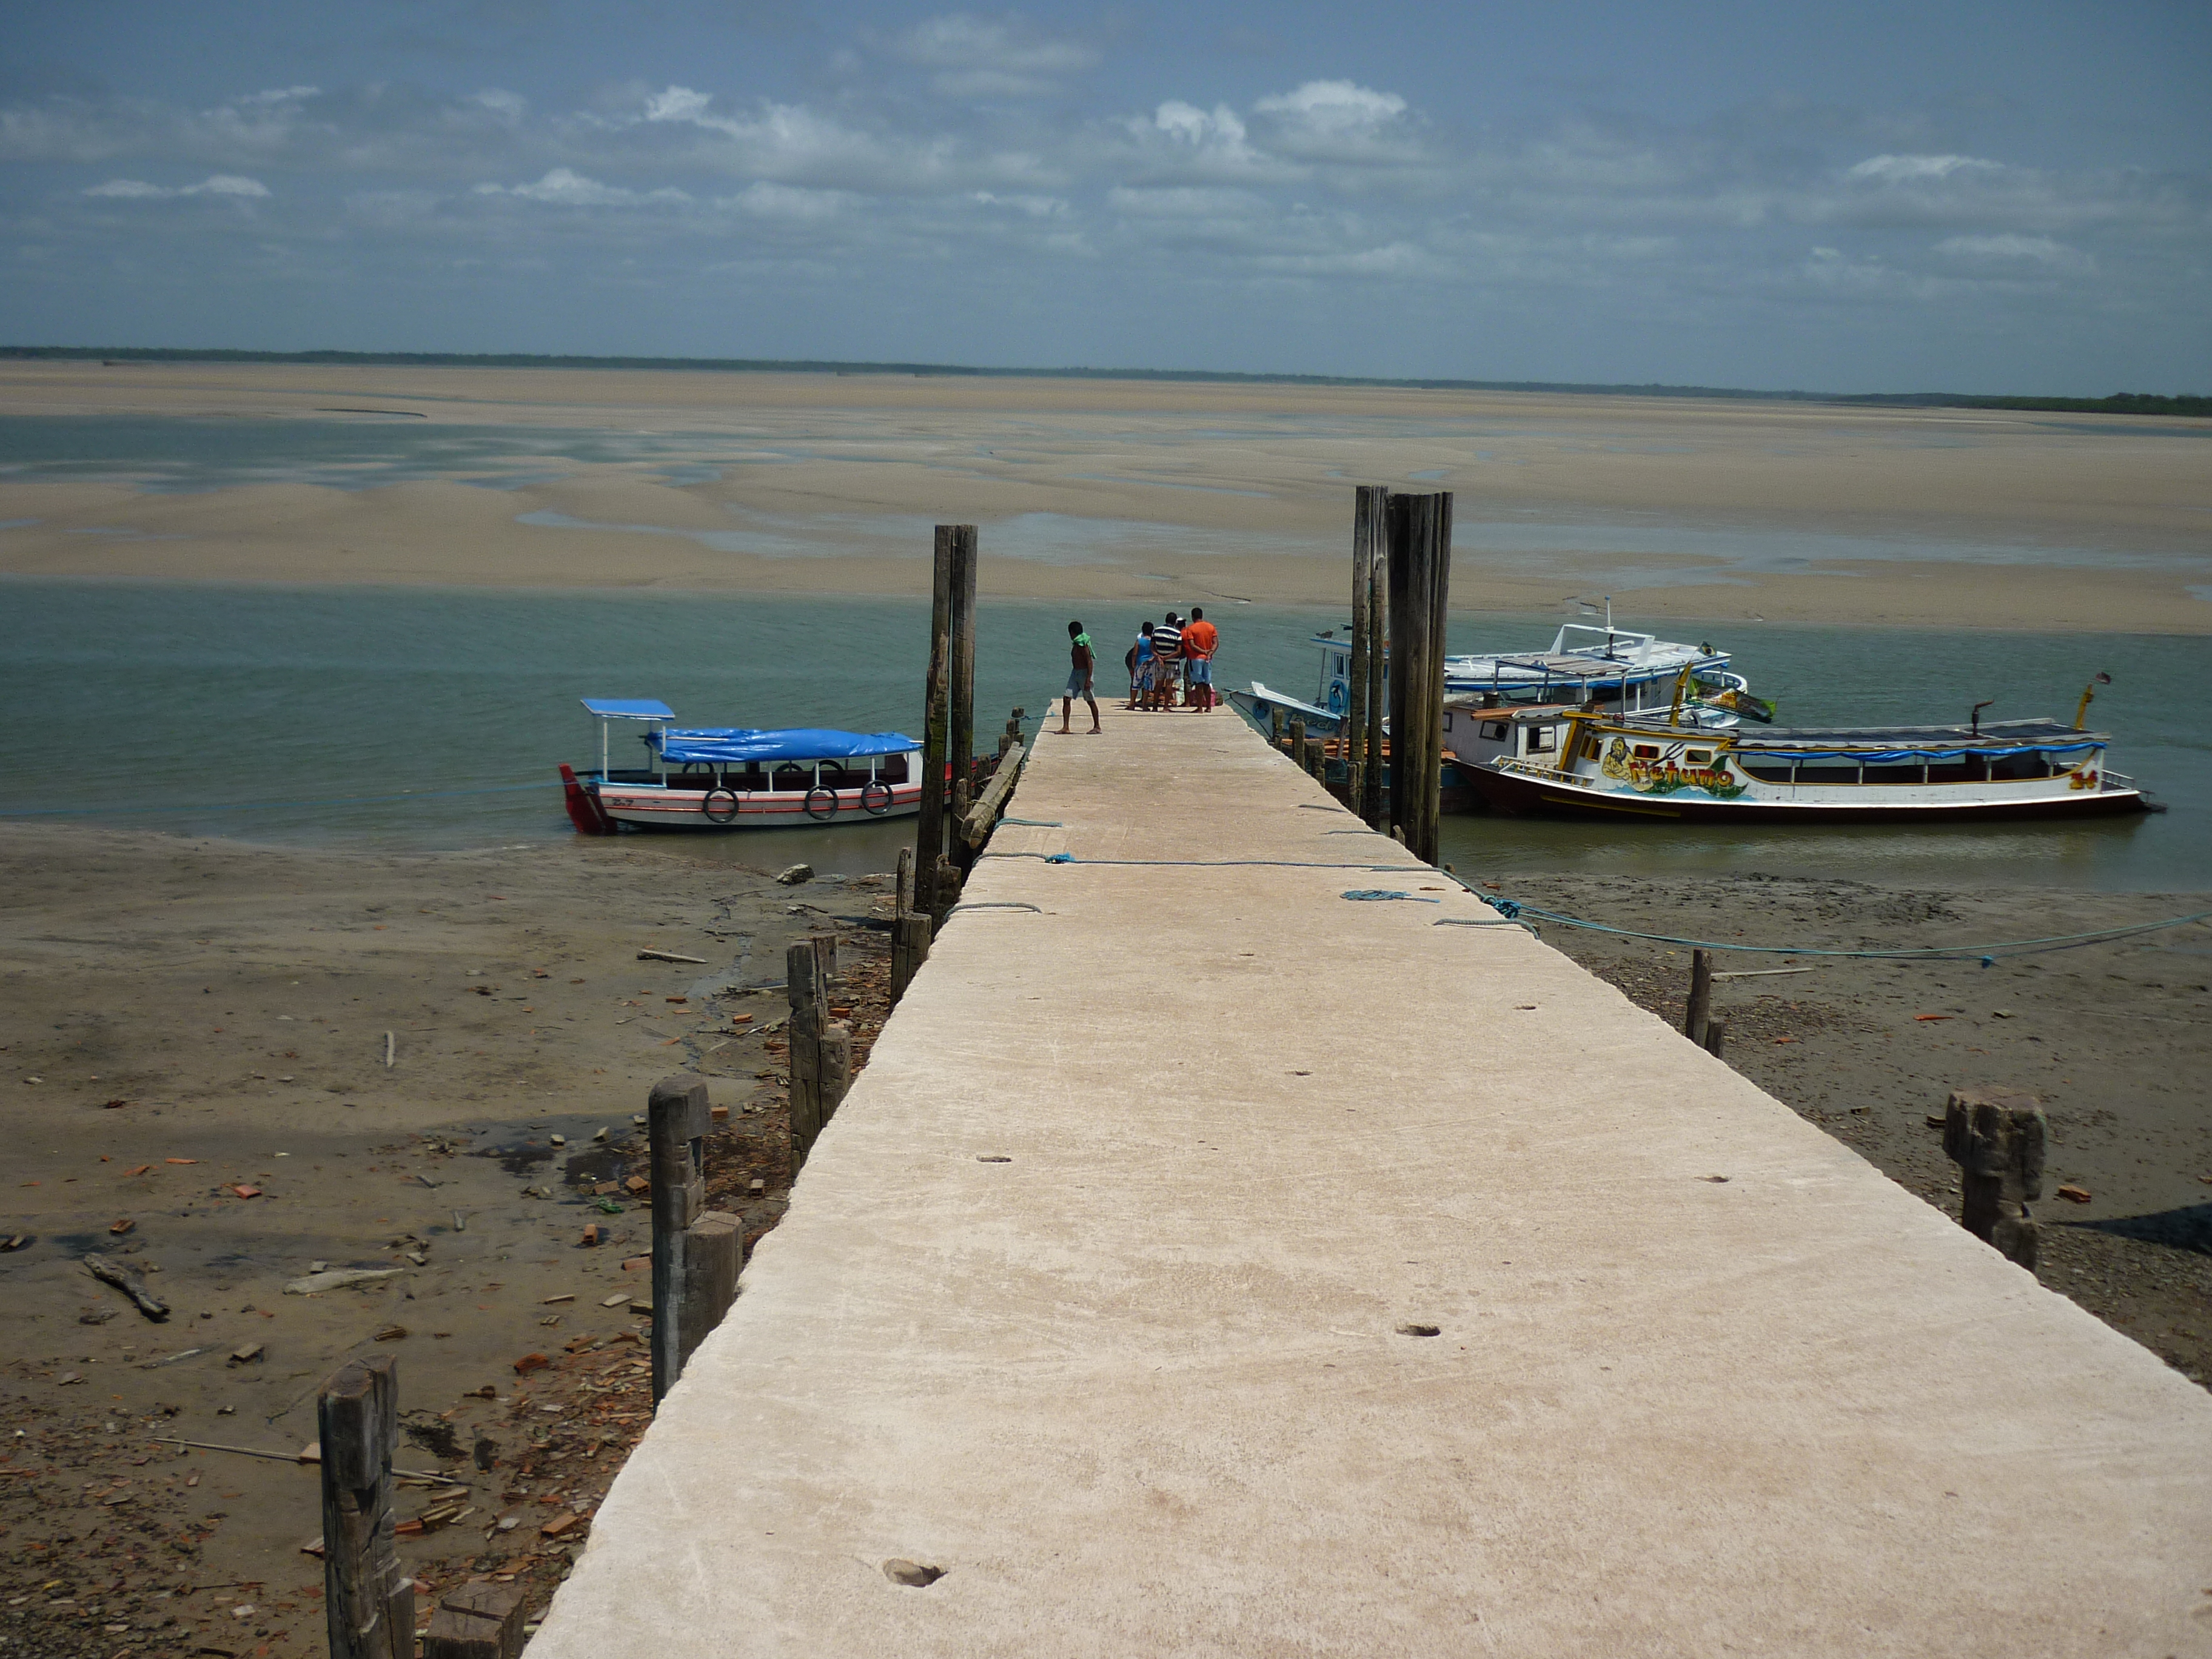 Marapanim Pará fonte: upload.wikimedia.org